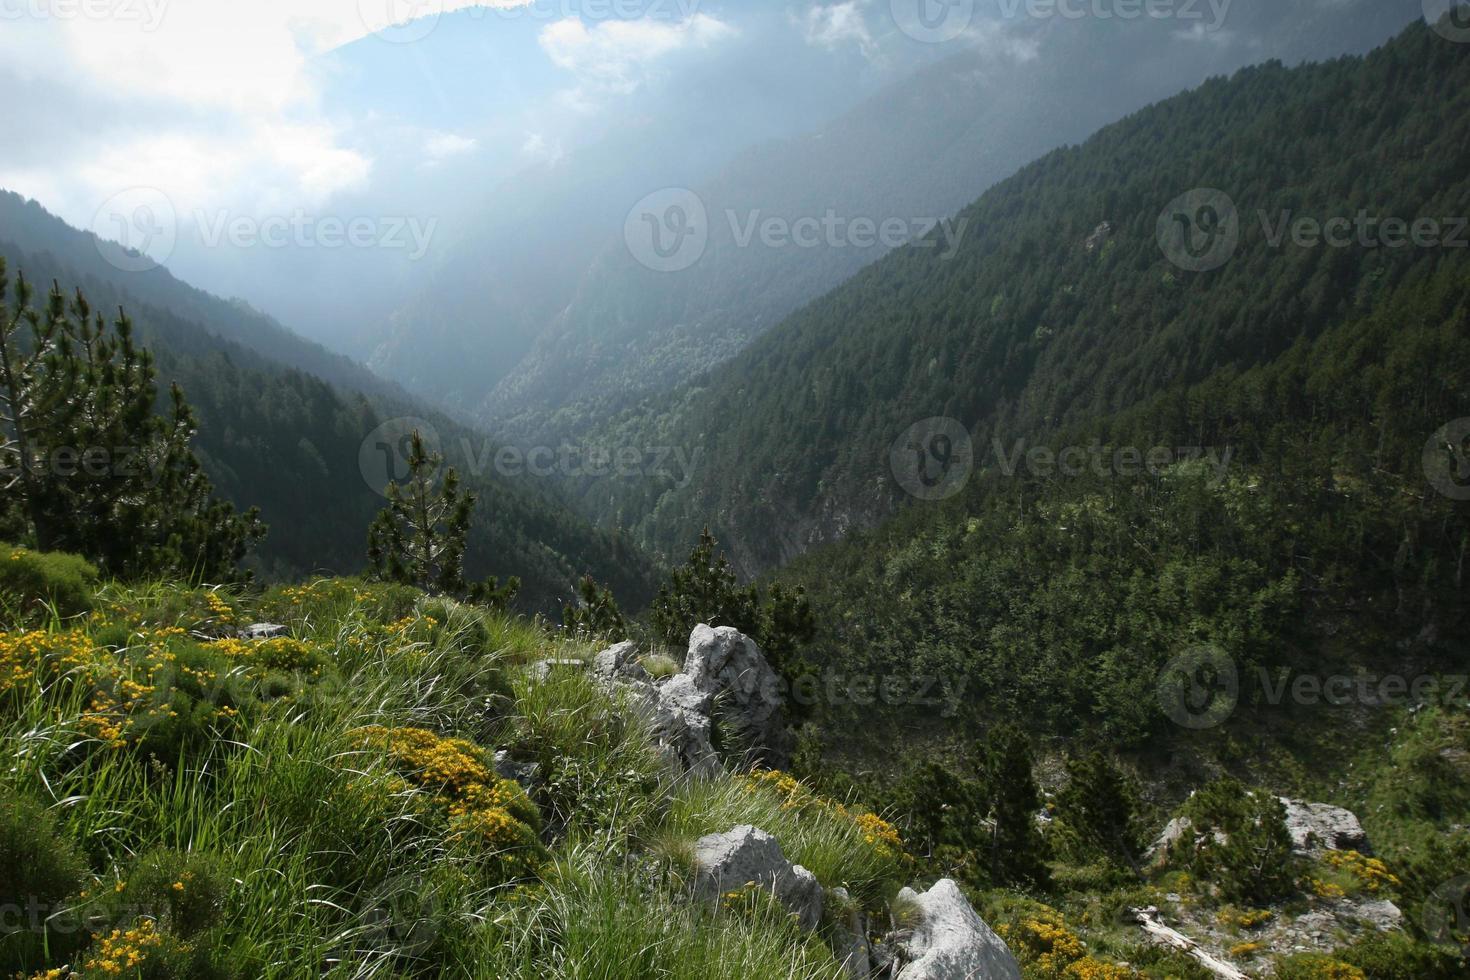 cena da floresta em olympus mountain-greece foto